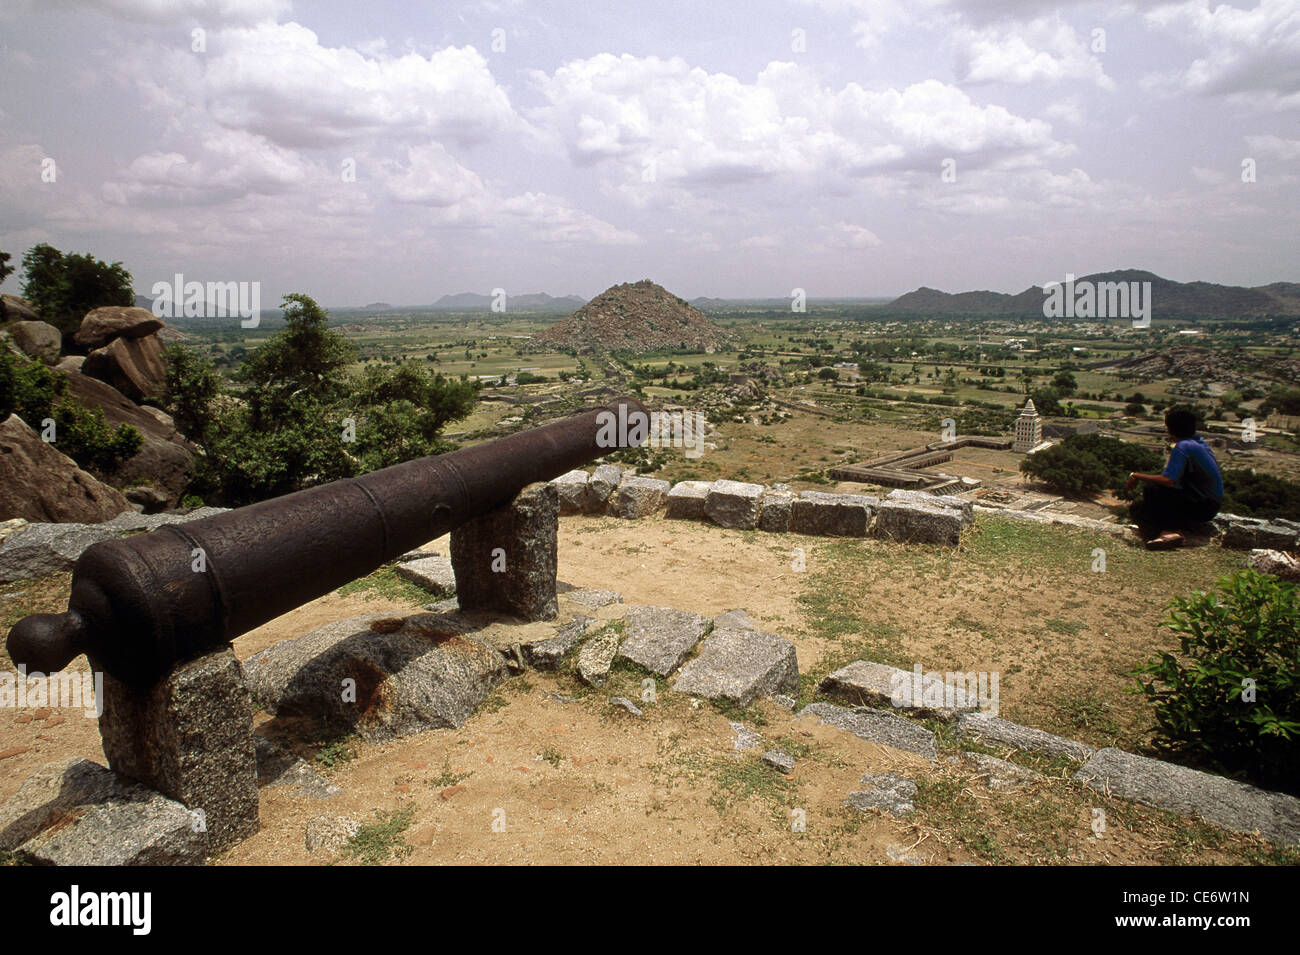 MAA 83294 : cannon gun on genji fort tamil nadu india - Stock Image